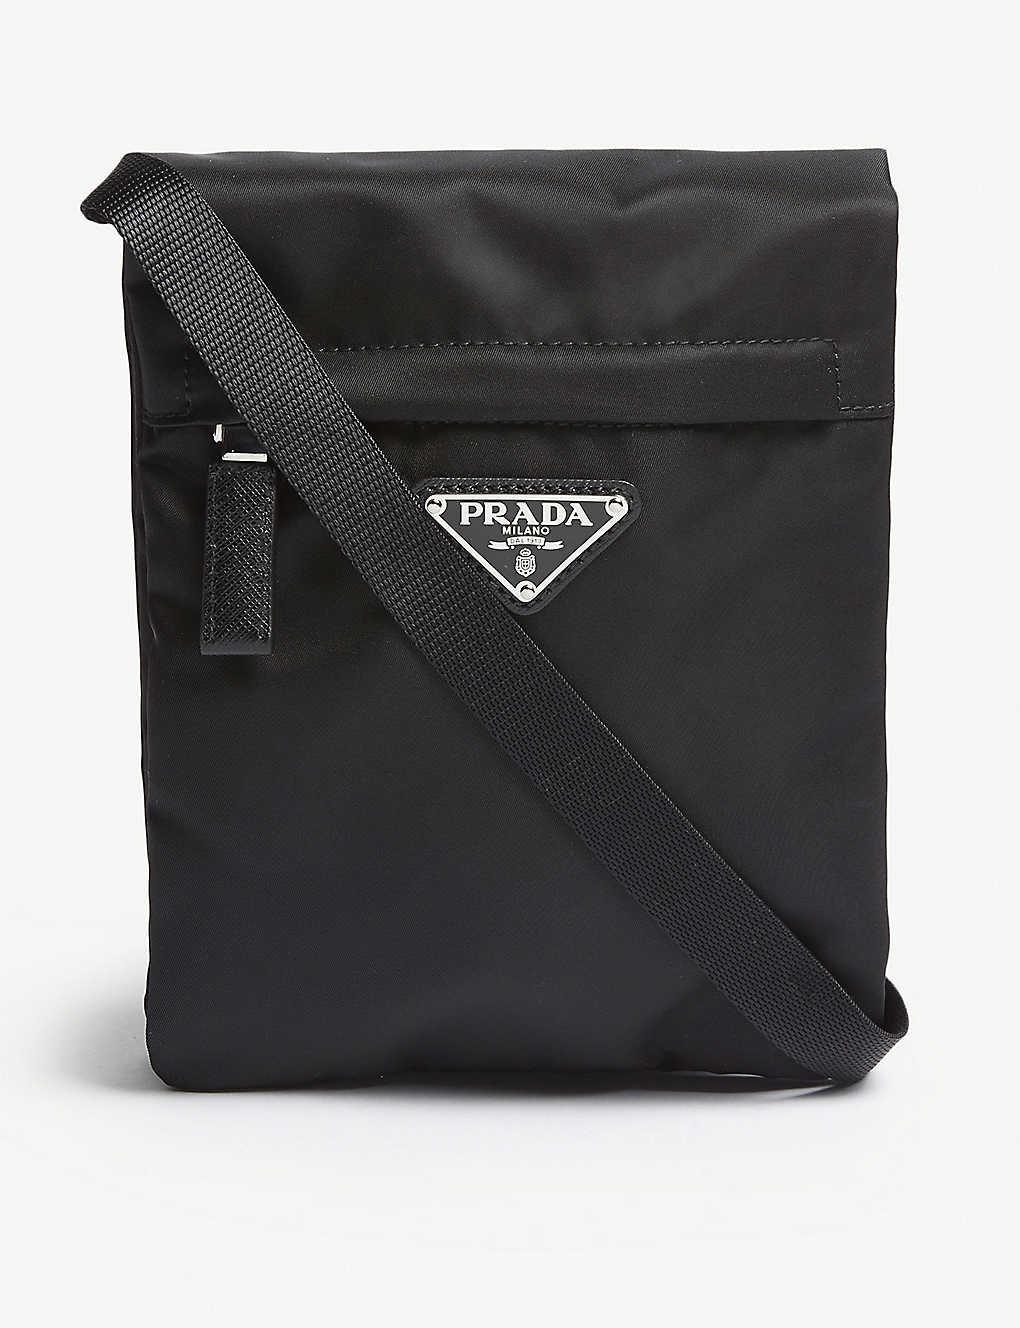 701585f43562 PRADA - Logo nylon cross-body pouch | Selfridges.com